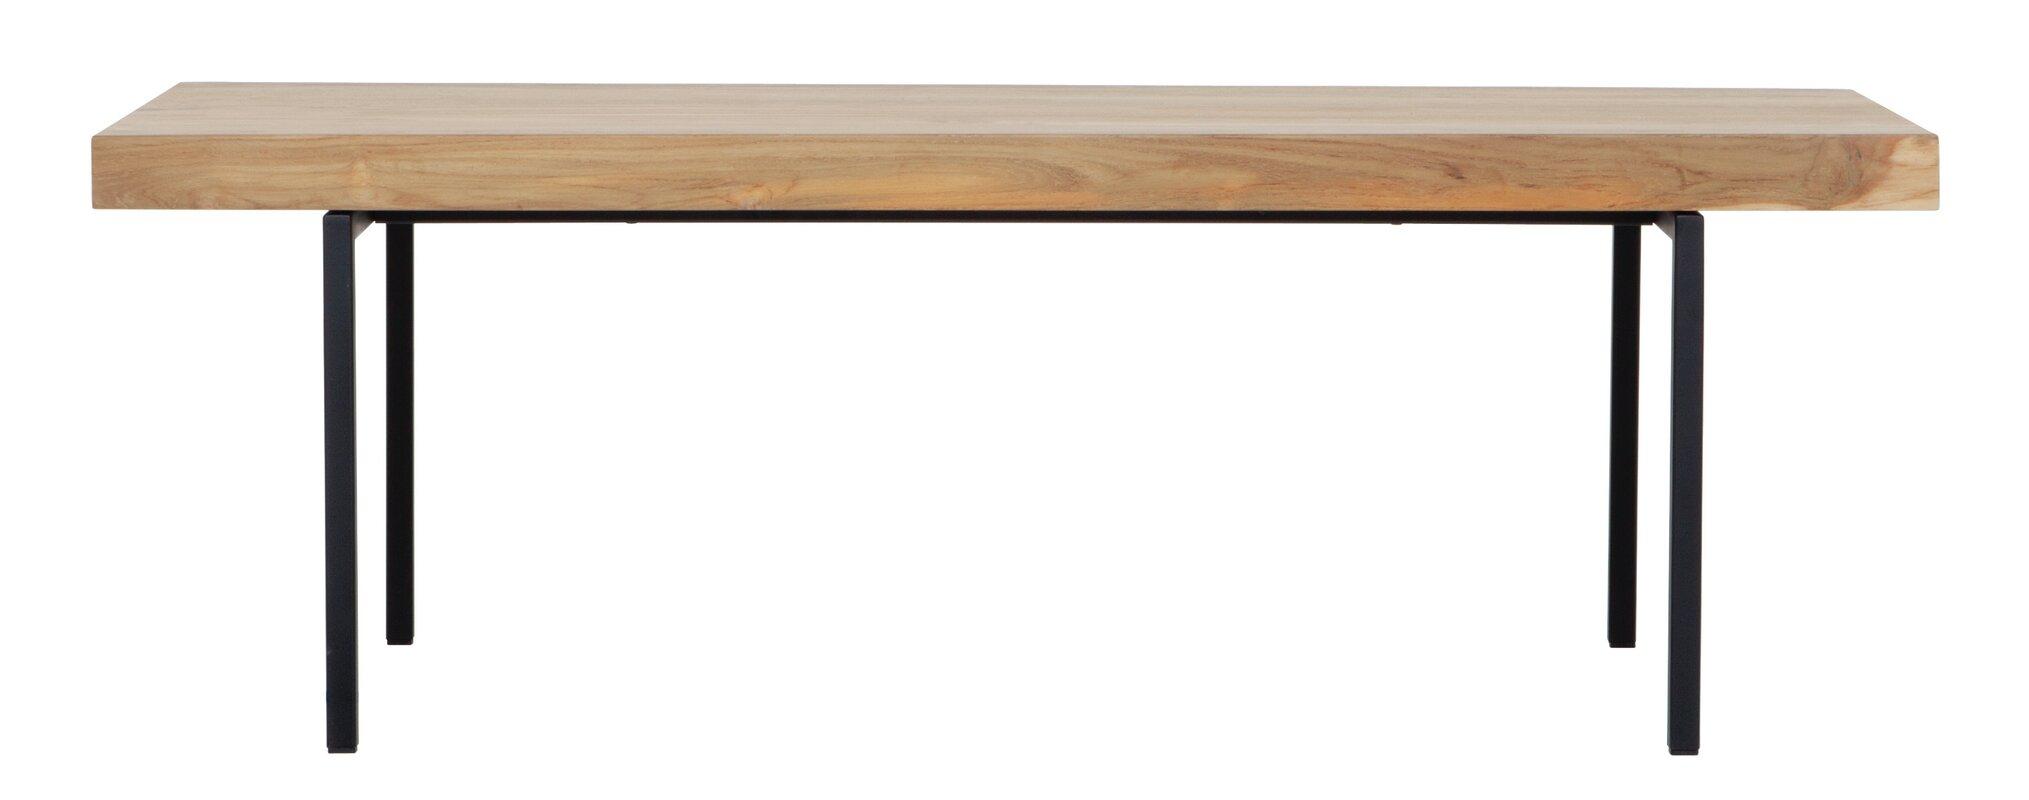 Reclaimed teak coffee table reviews allmodern reclaimed teak coffee table geotapseo Image collections